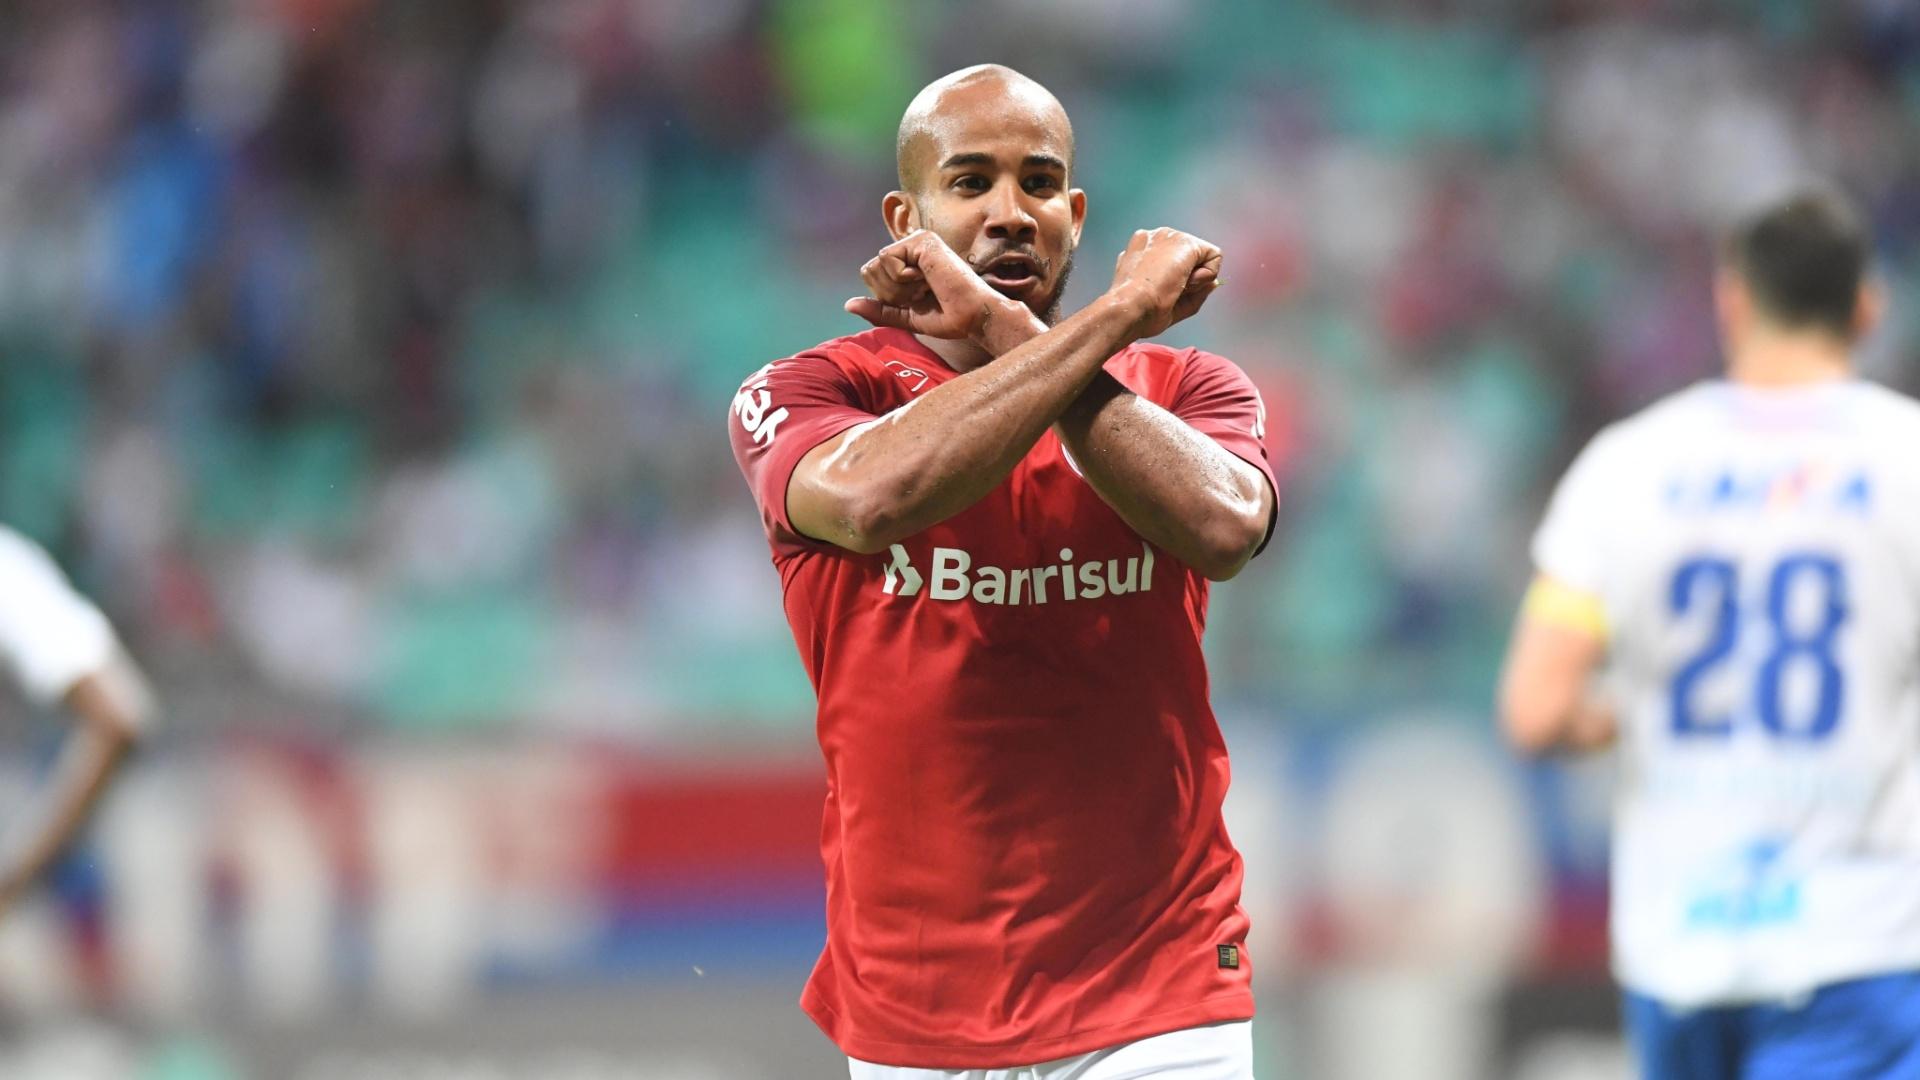 Patrick comemora gol do Internacional contra o Bahia, pelo Campeonato Brasileiro